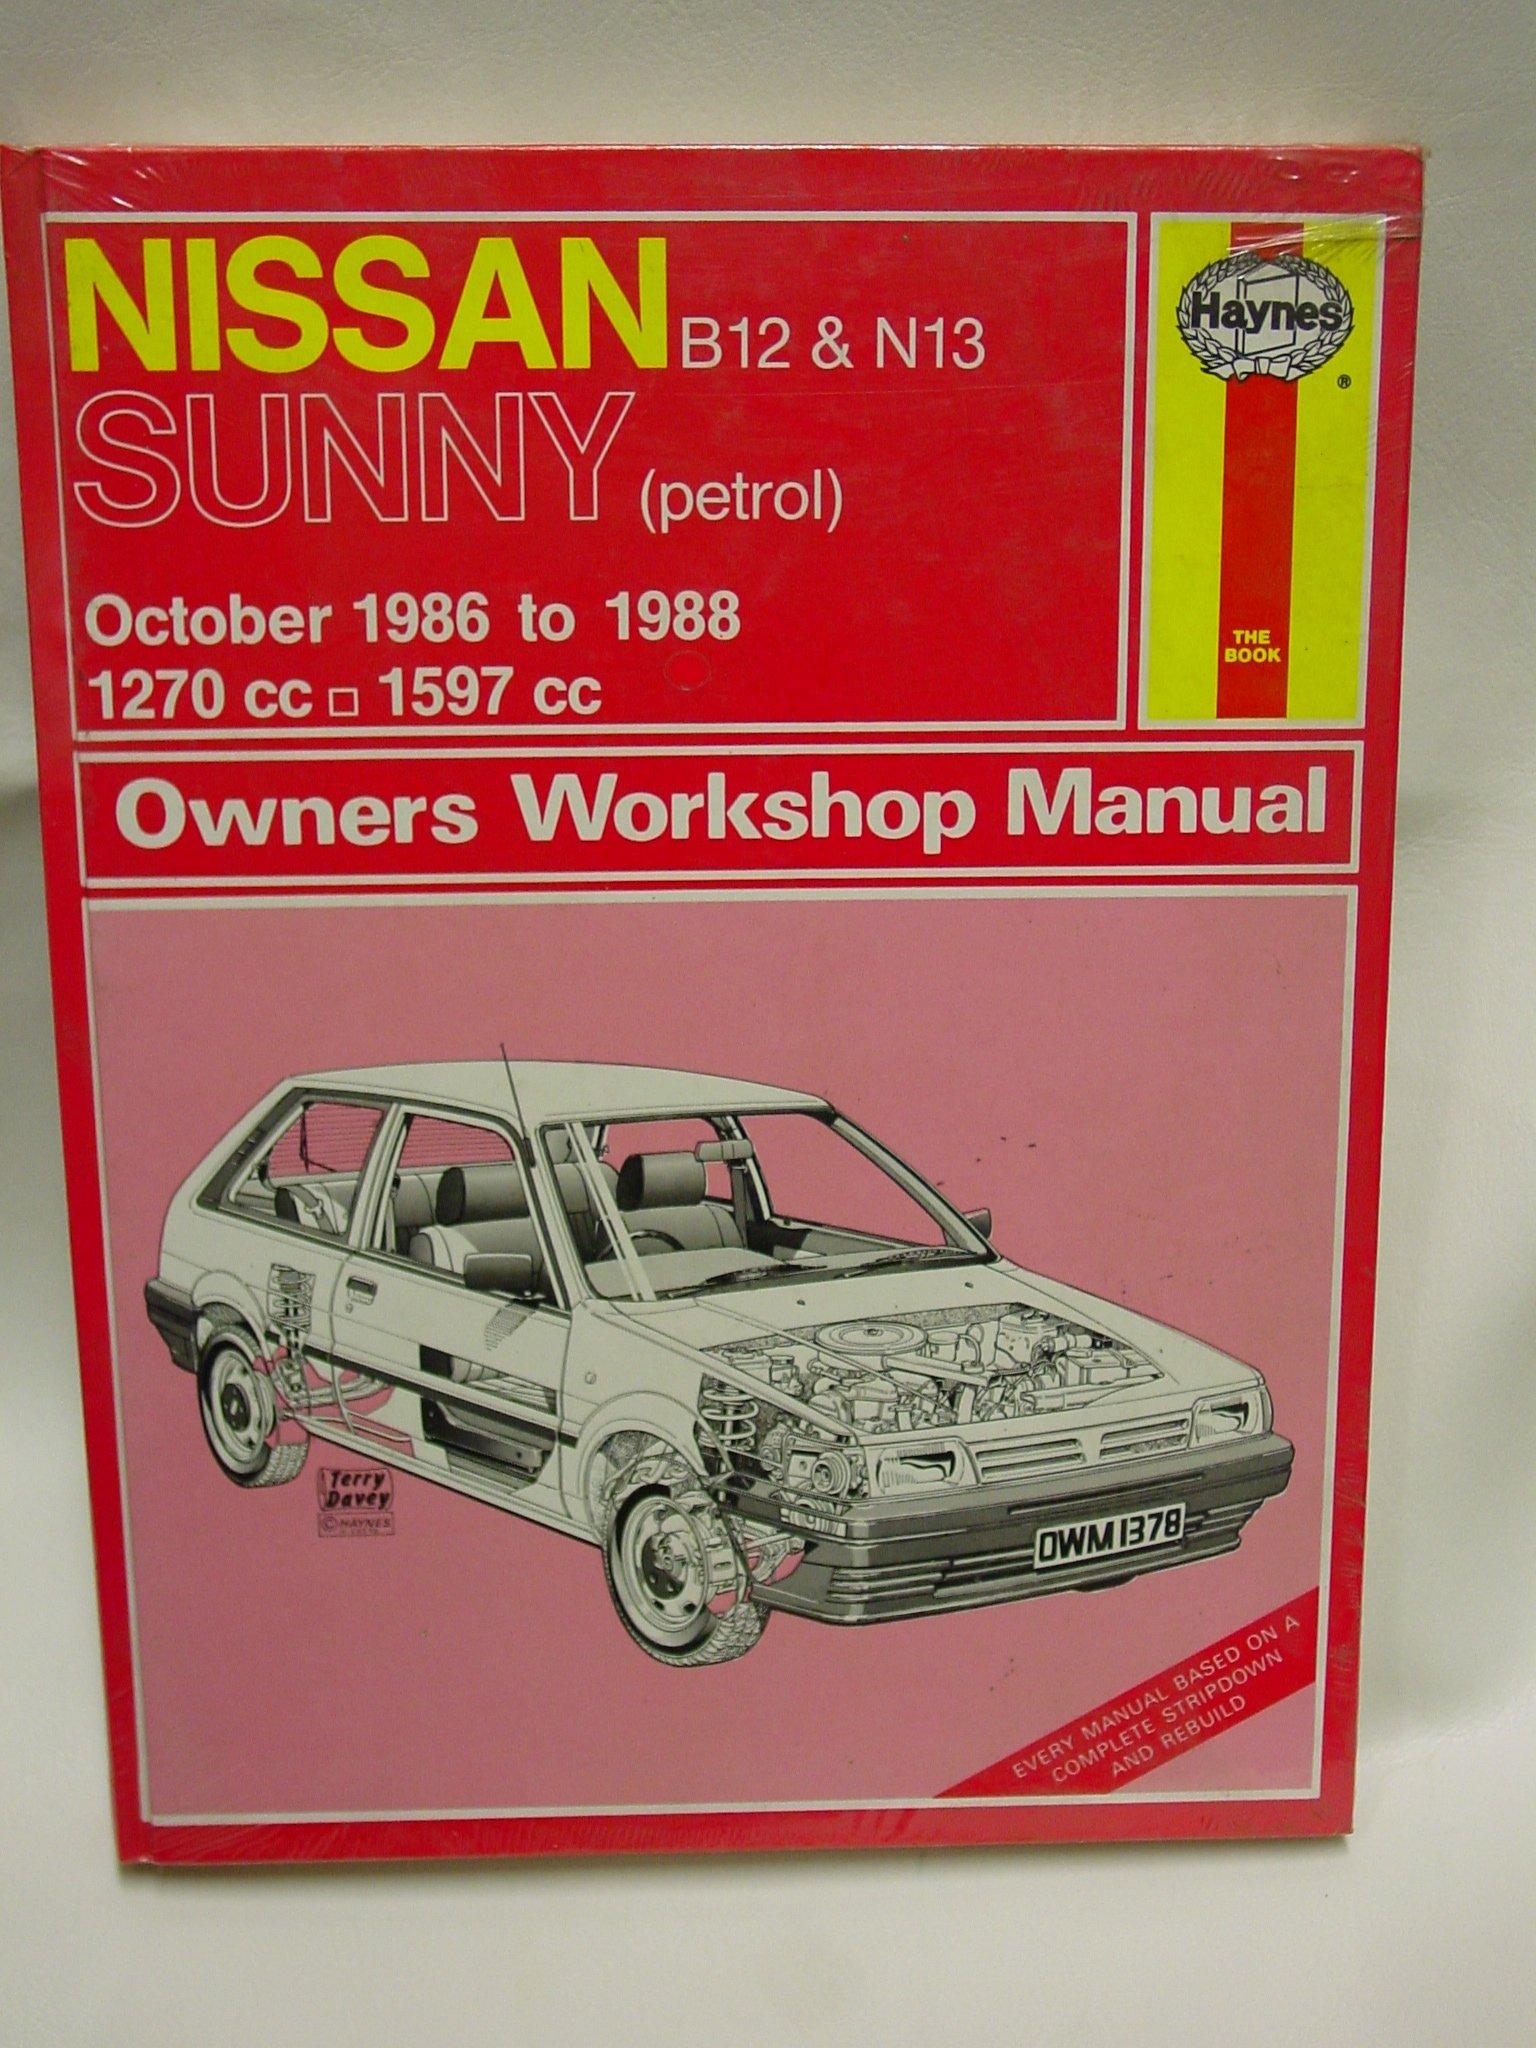 NISSAN B12 & N13 SUNNY Oct 1986-1988 (Haynes Owner's Workshop Manual):  Amazon.co.uk: Ian M Coomber: 9781850103783: Books